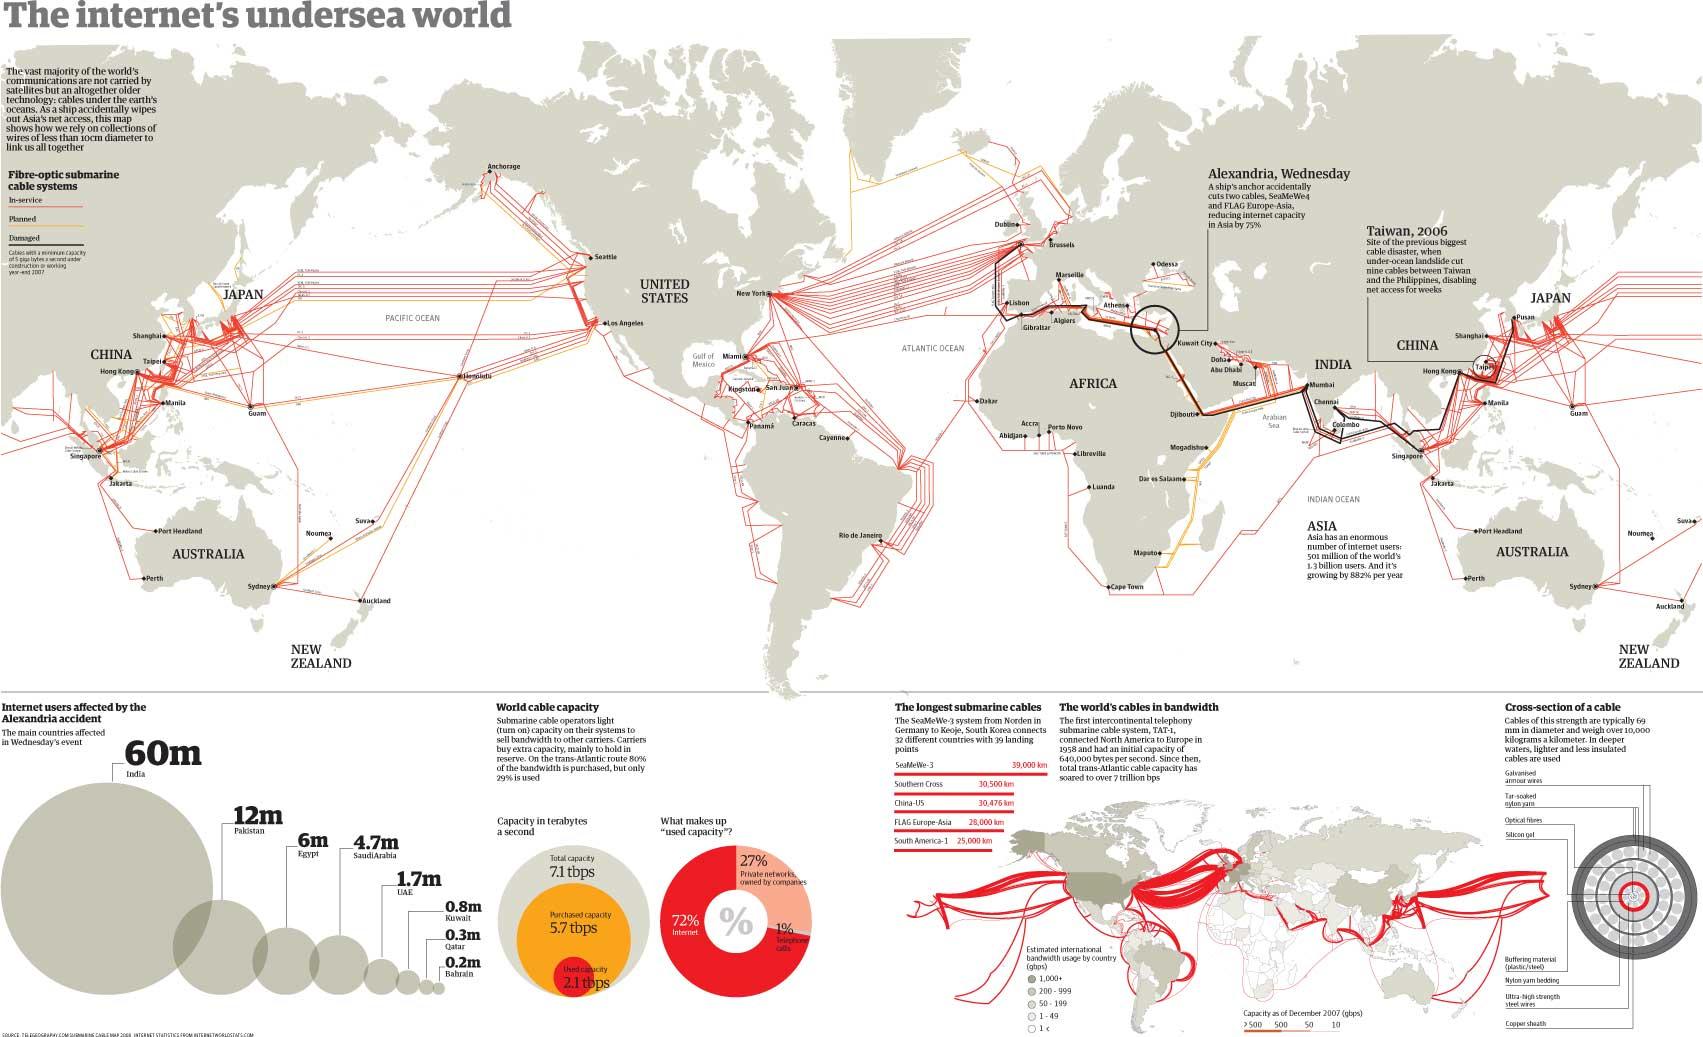 The Internet's Undersea World infographic